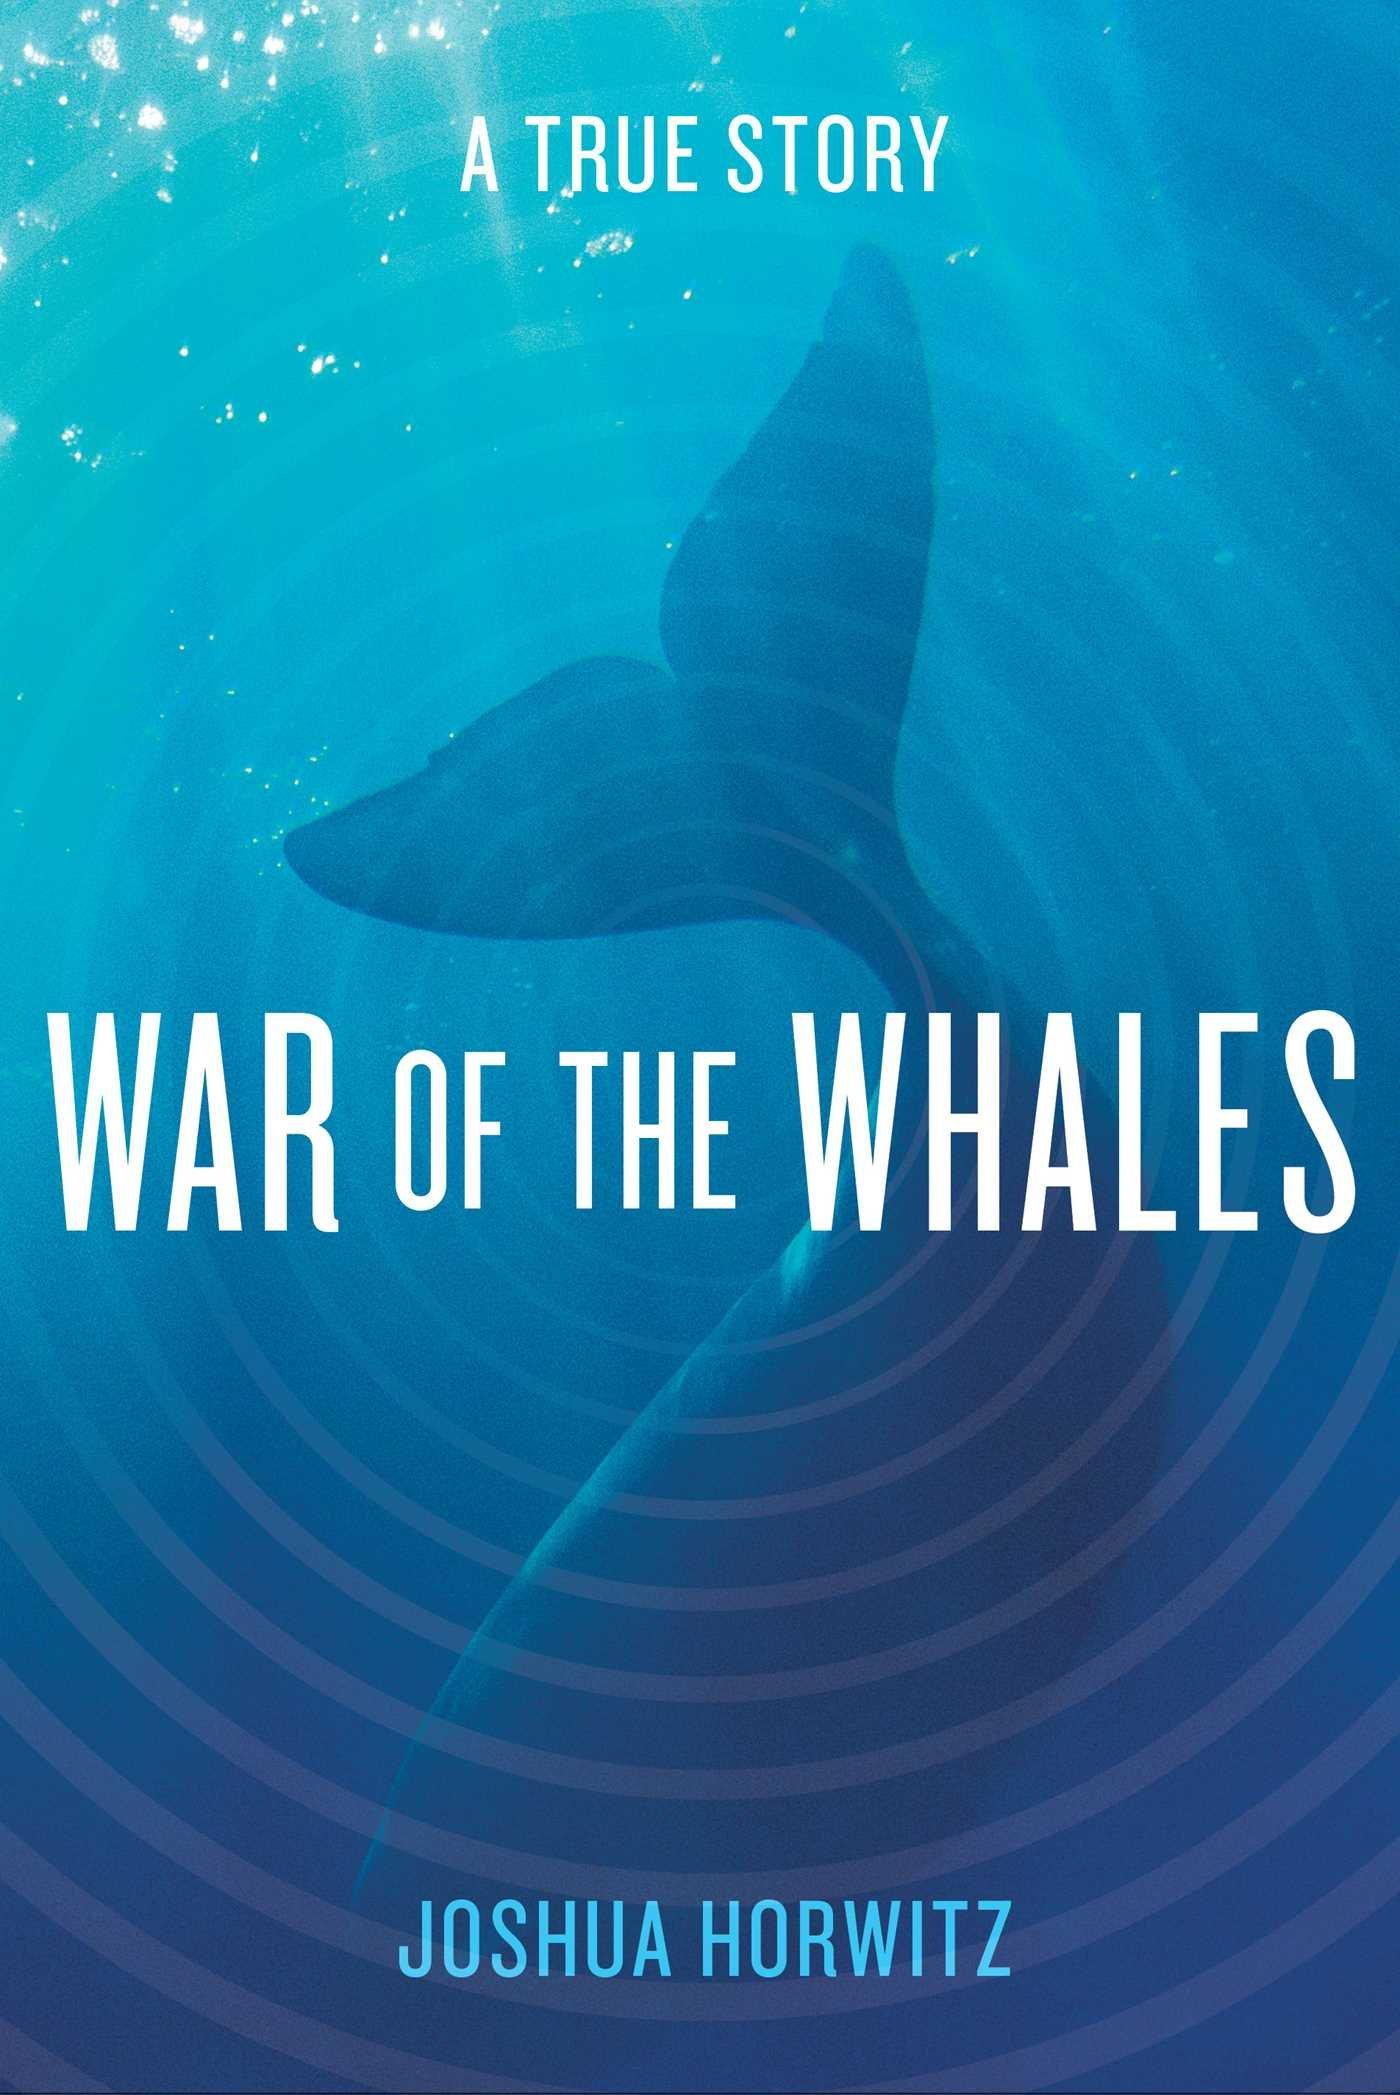 War Whales Story Joshua Horwitz product image